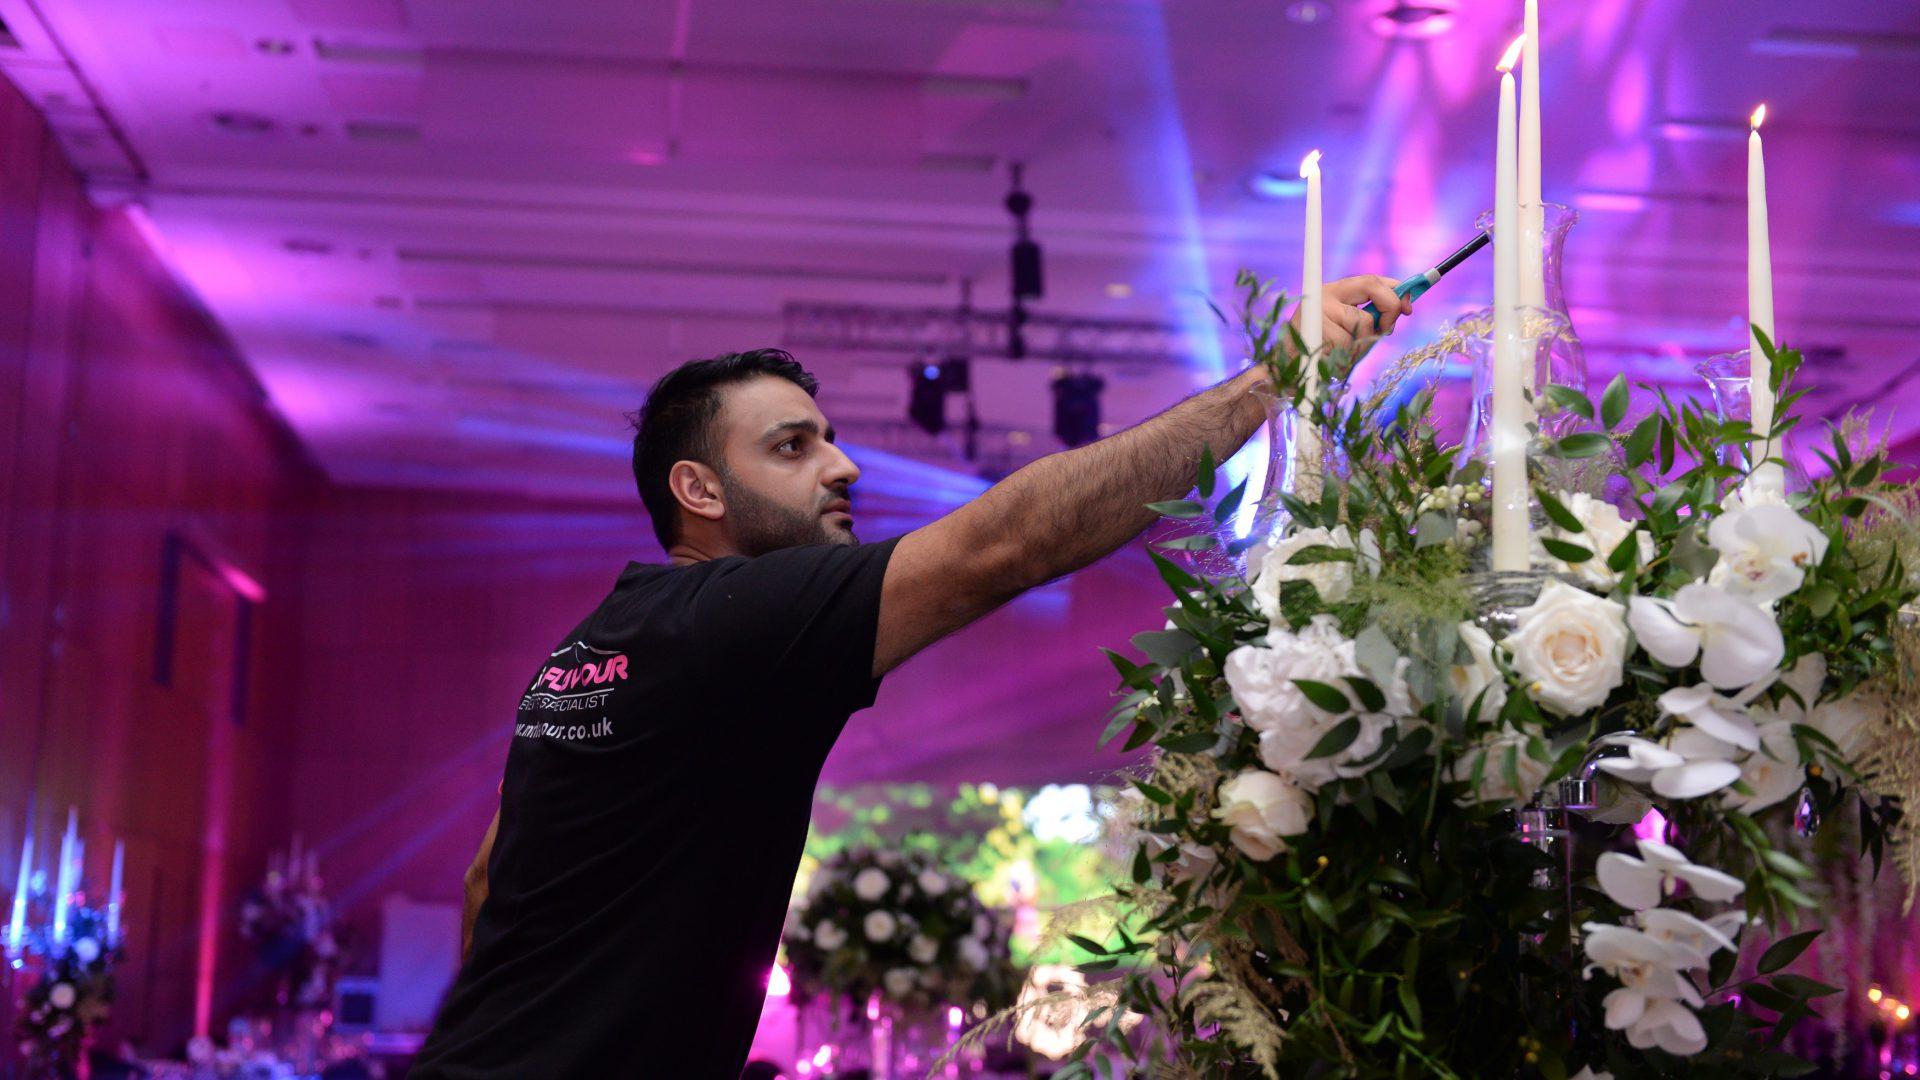 pakistani wedding planners manchester